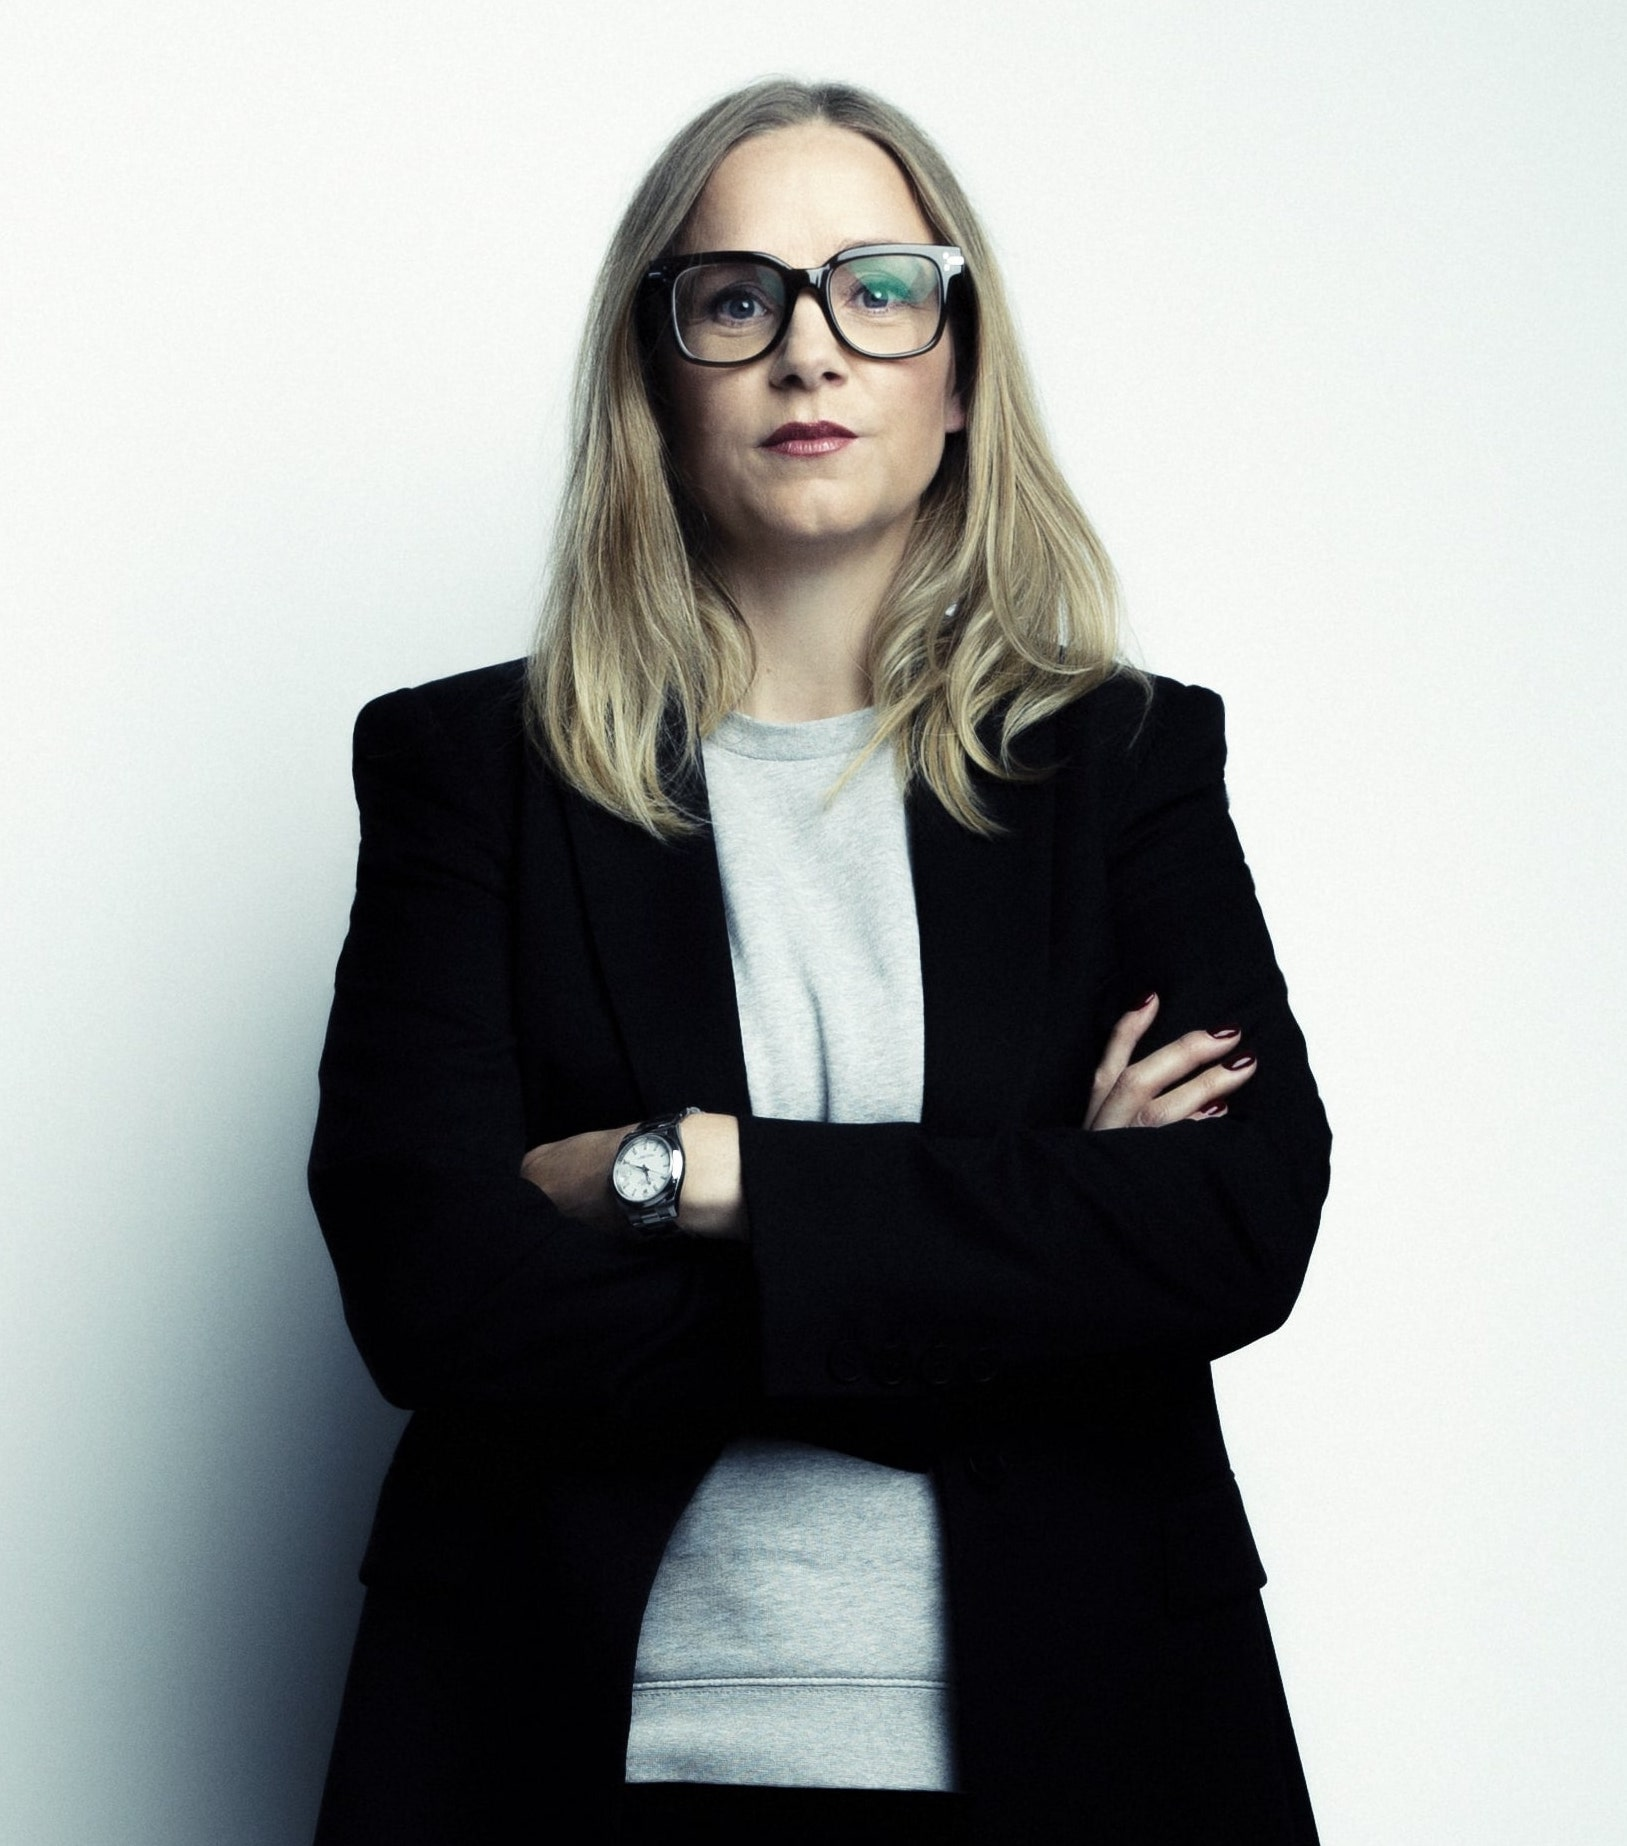 Pernilla Ekman, CEO of Zound Industries